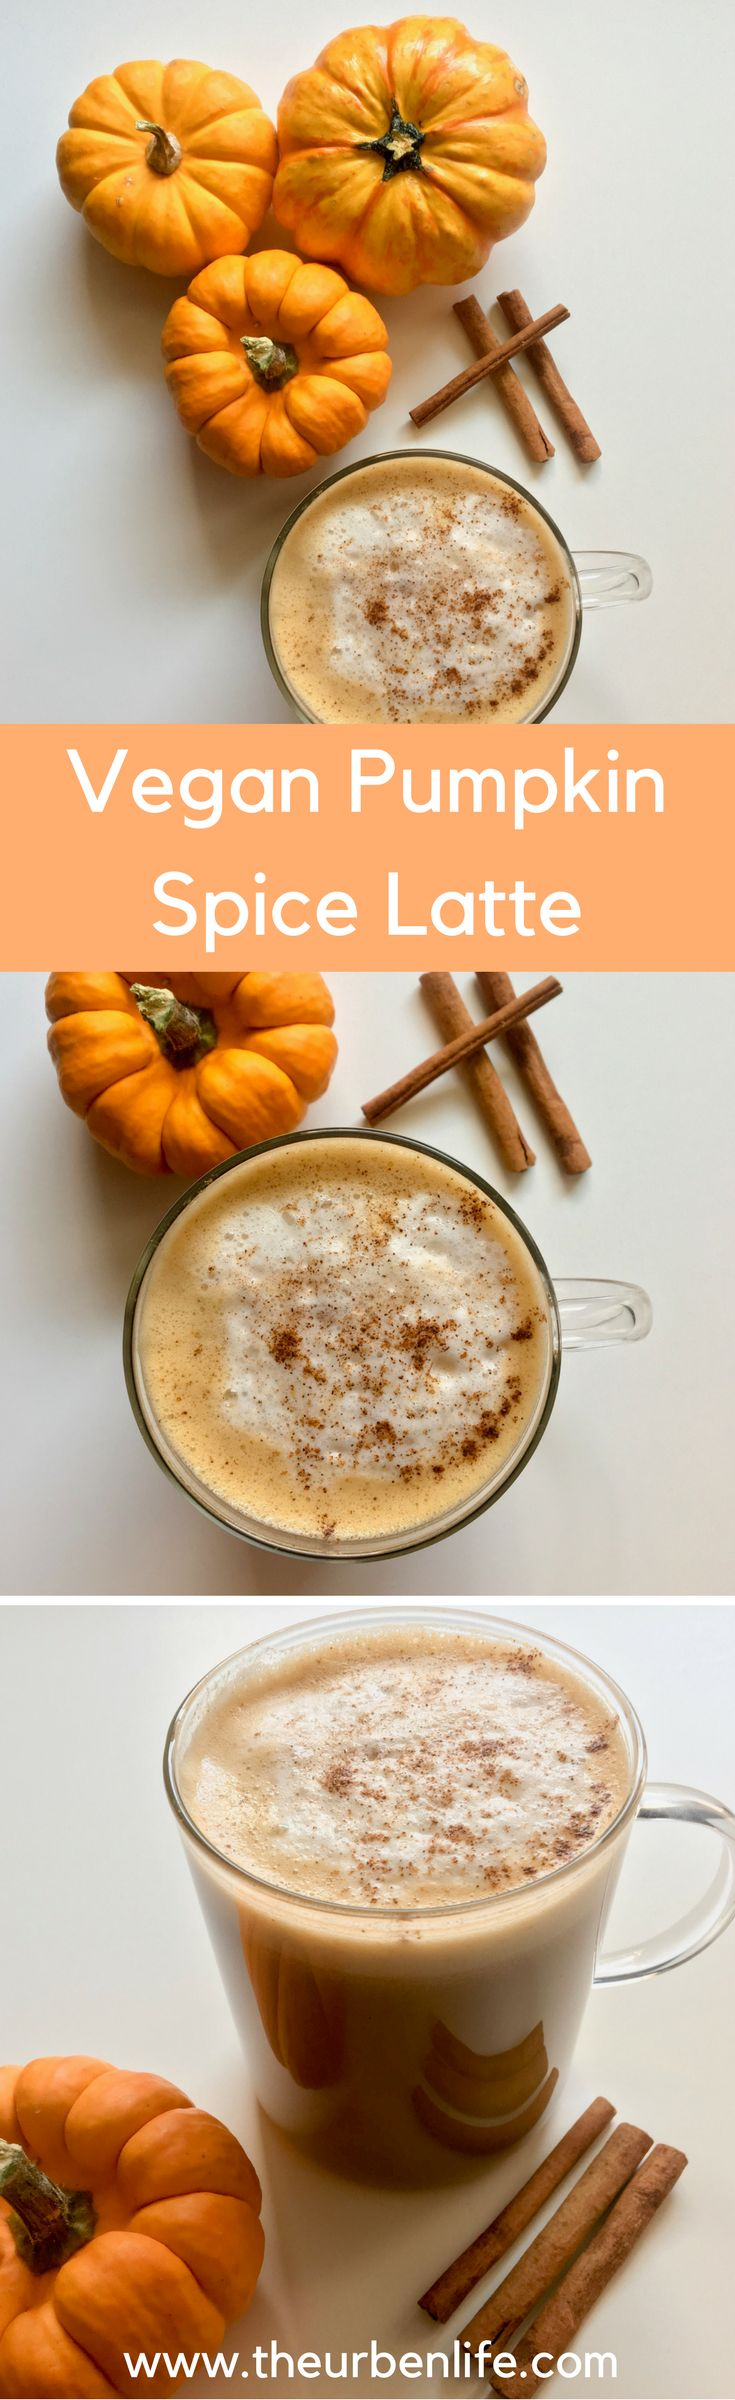 Vegan Pumpkin Spice Latte (Dairy Free)